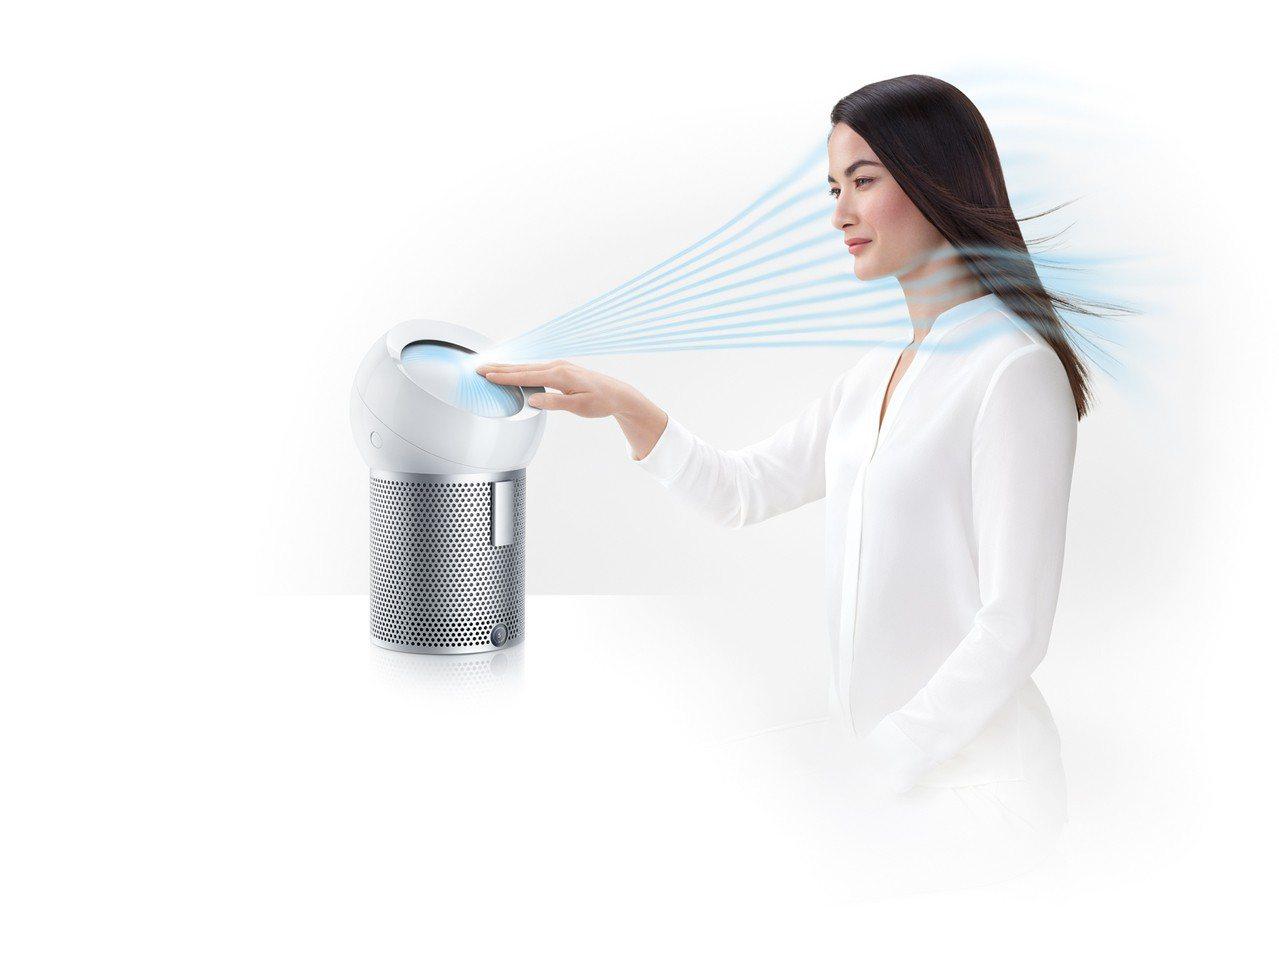 Dyson Pure Cool Me個人空氣清淨風扇具備全新的「核心氣流科技」,...